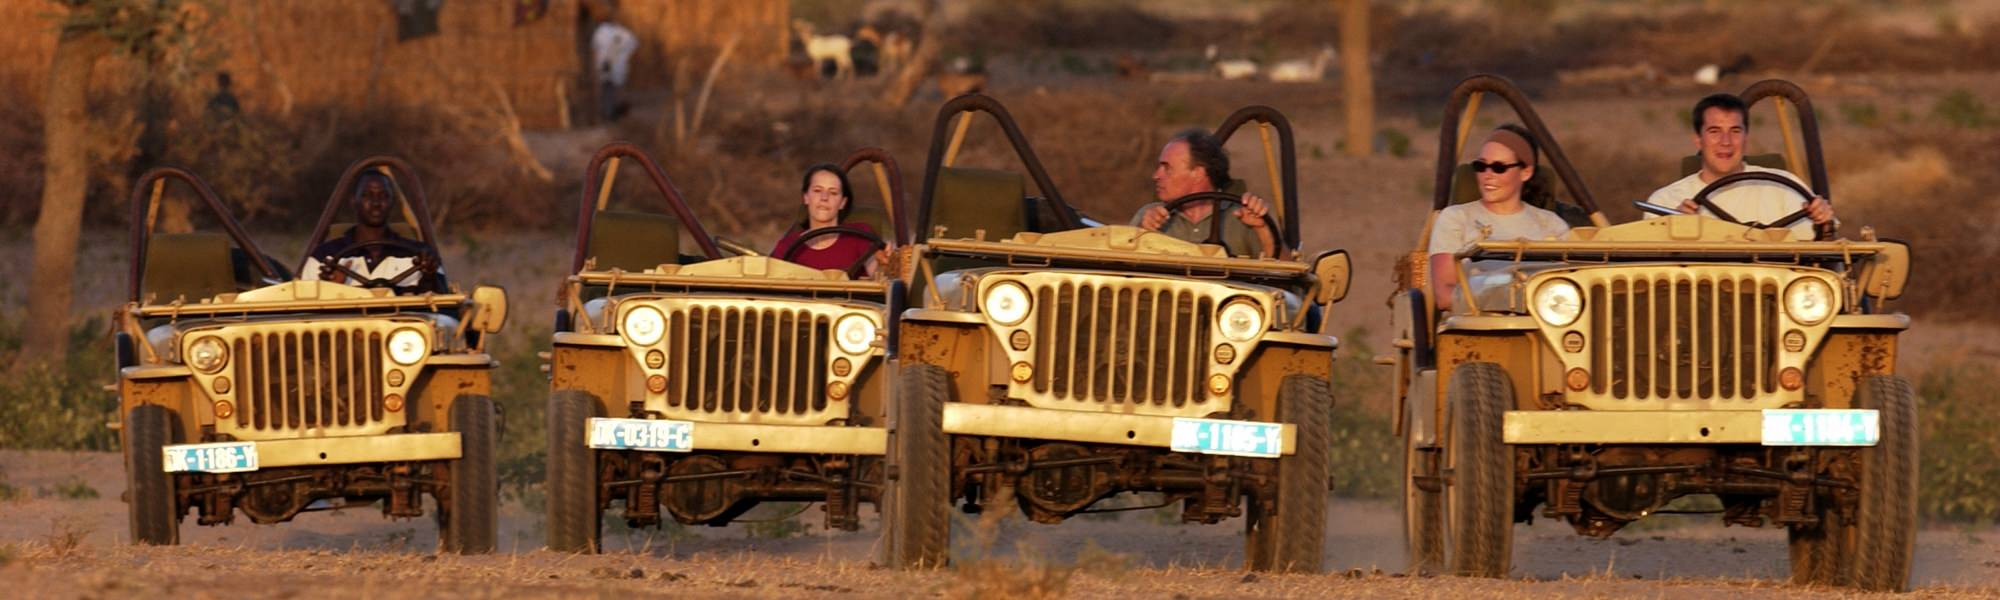 Jeep Willys Senegal Bou el Mogdad